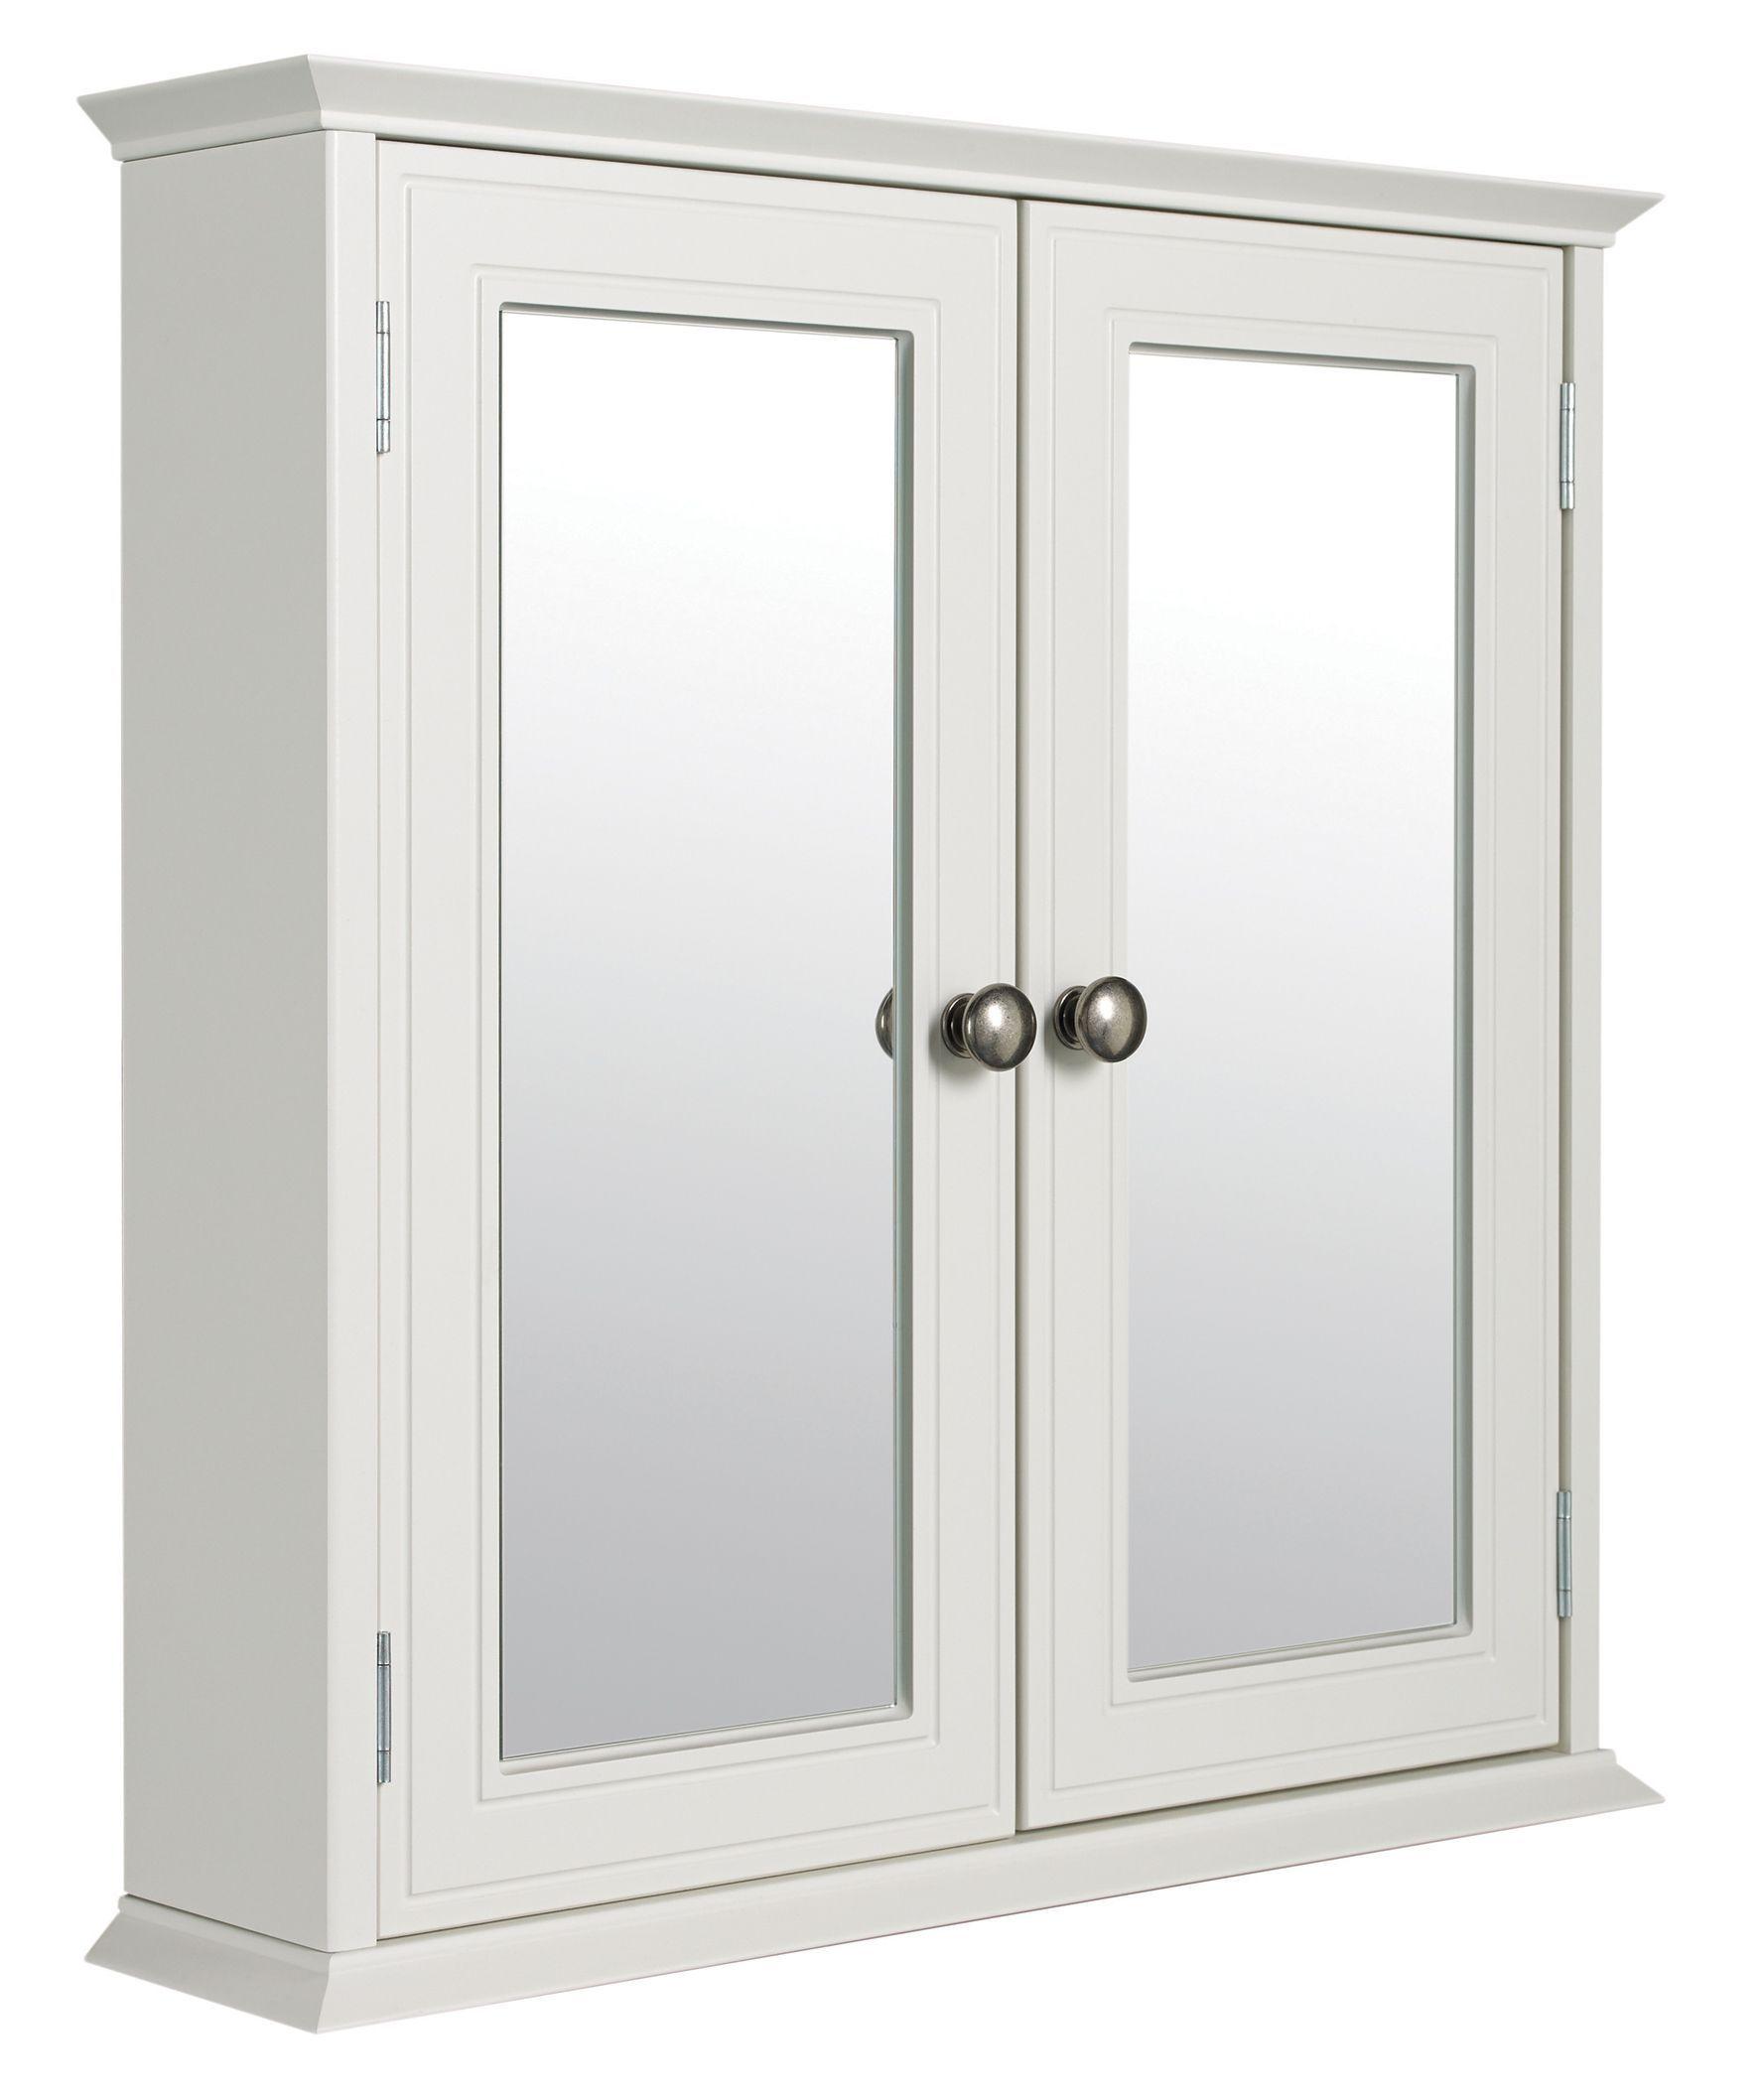 Cooke & Lewis Romano Double Door White Mirror Cabinet | Mirror ...